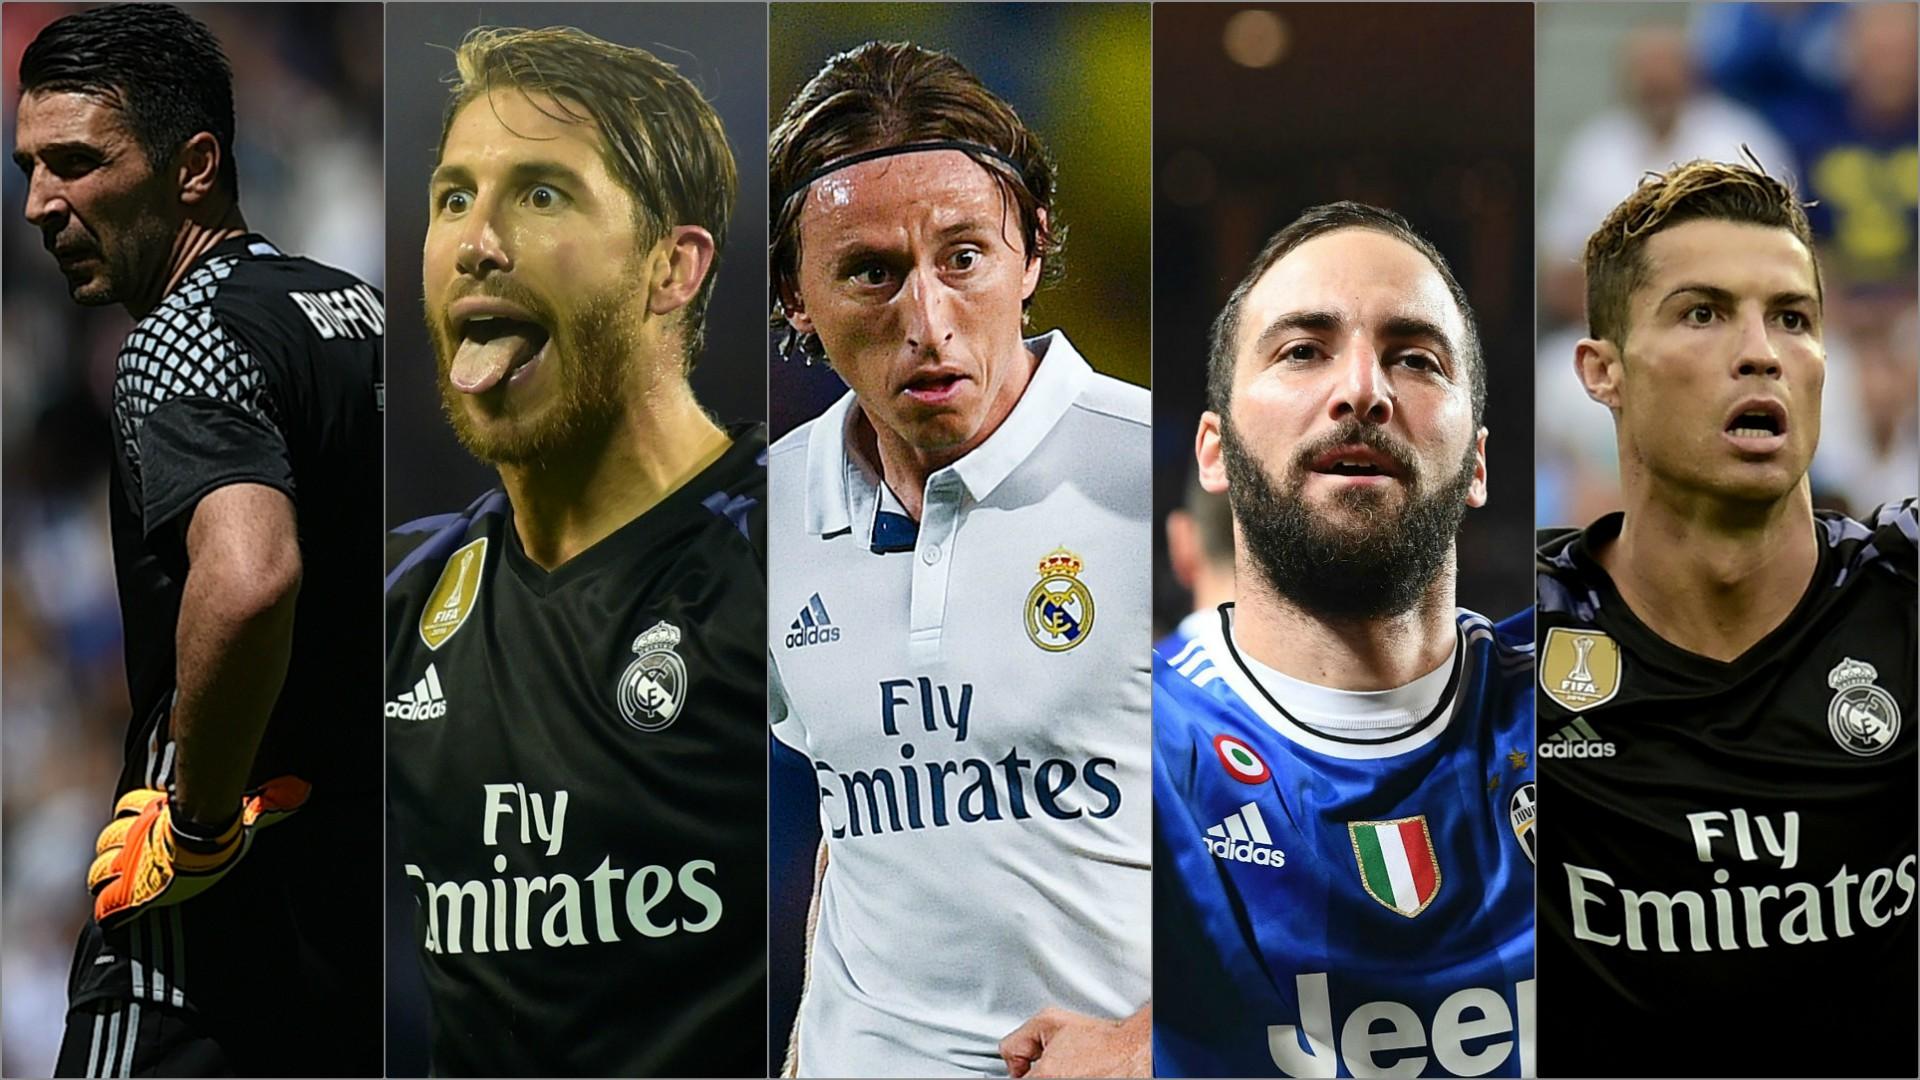 Juventus-Real Madrid : Où regarder le match en direct ?